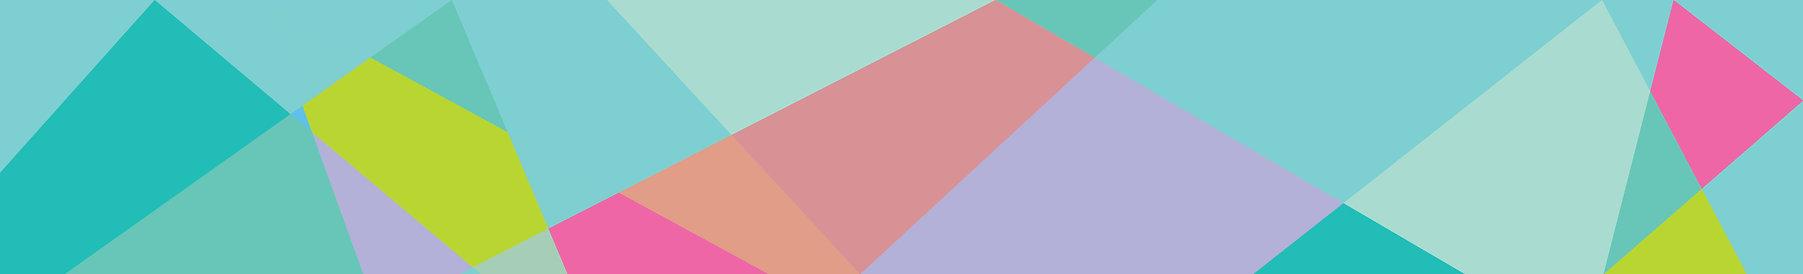 cabezal web-01.jpg